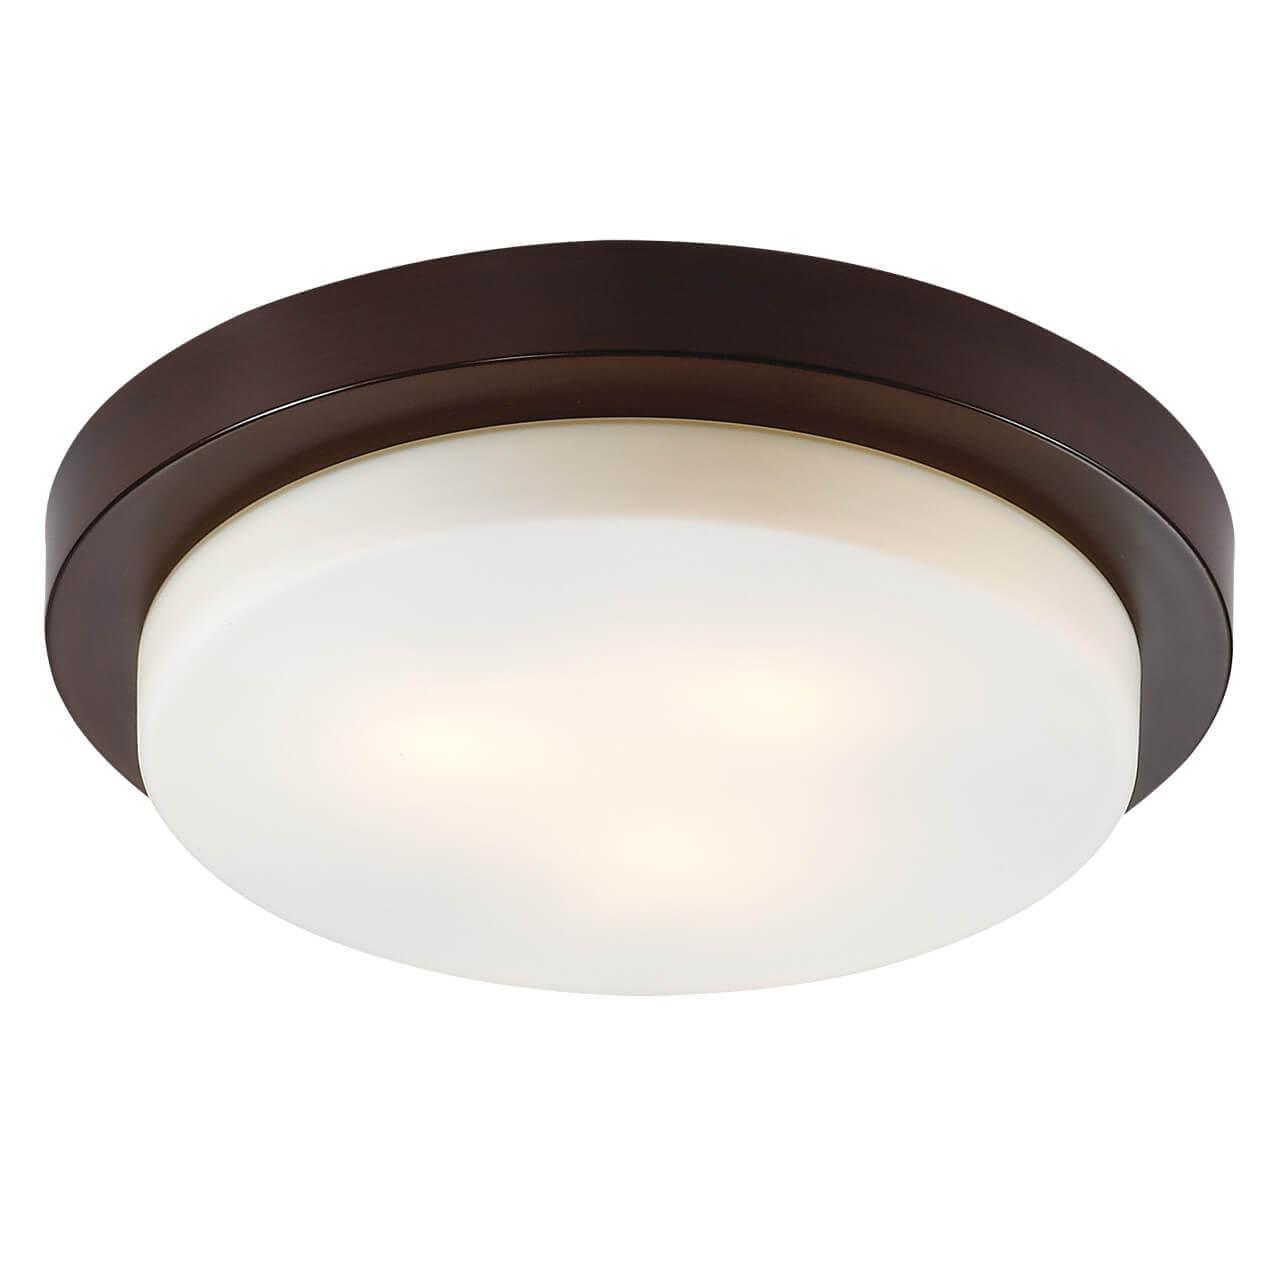 Светильник Odeon Light 2744/3C Drops цена 2017